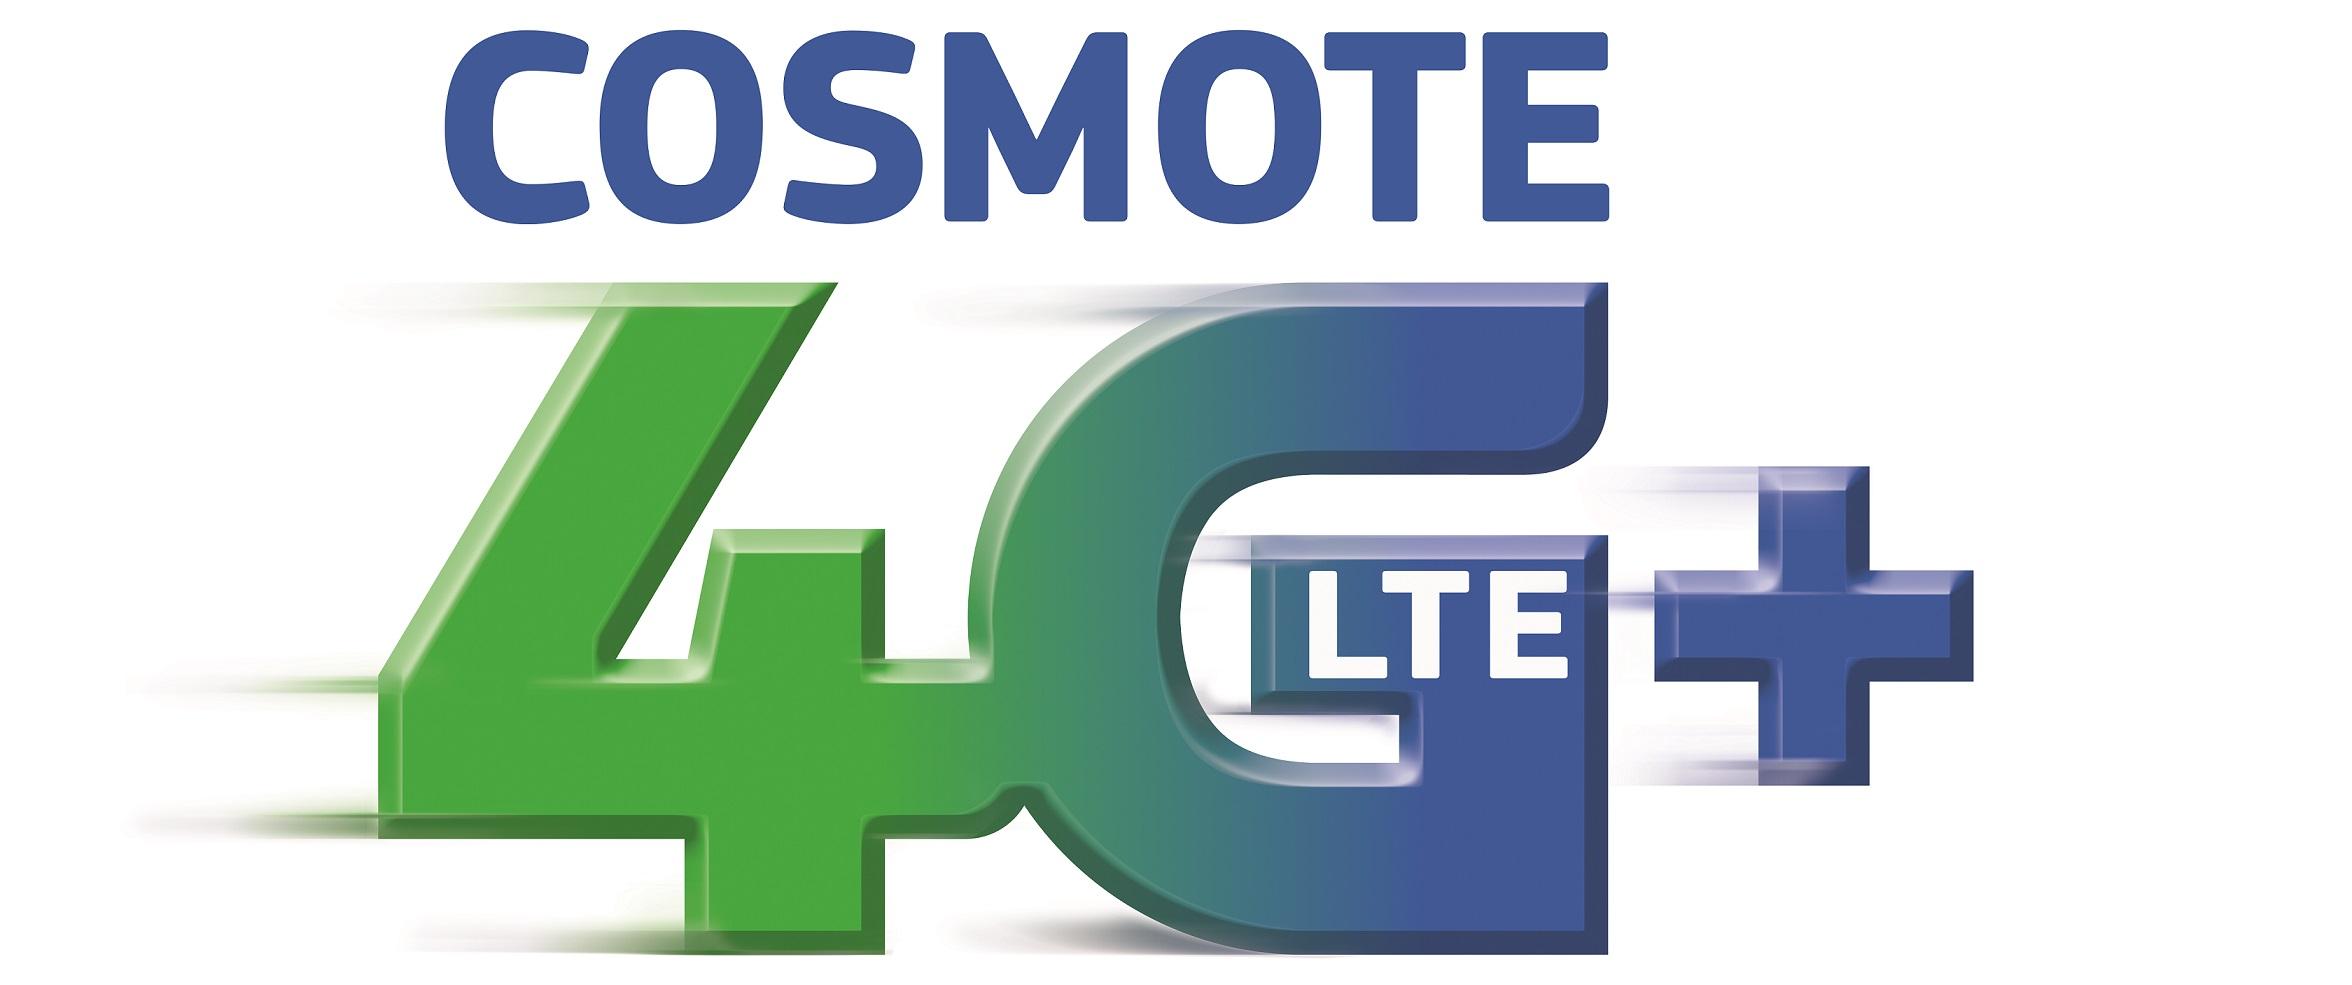 COSMOTE 4G+ NEW CMYK